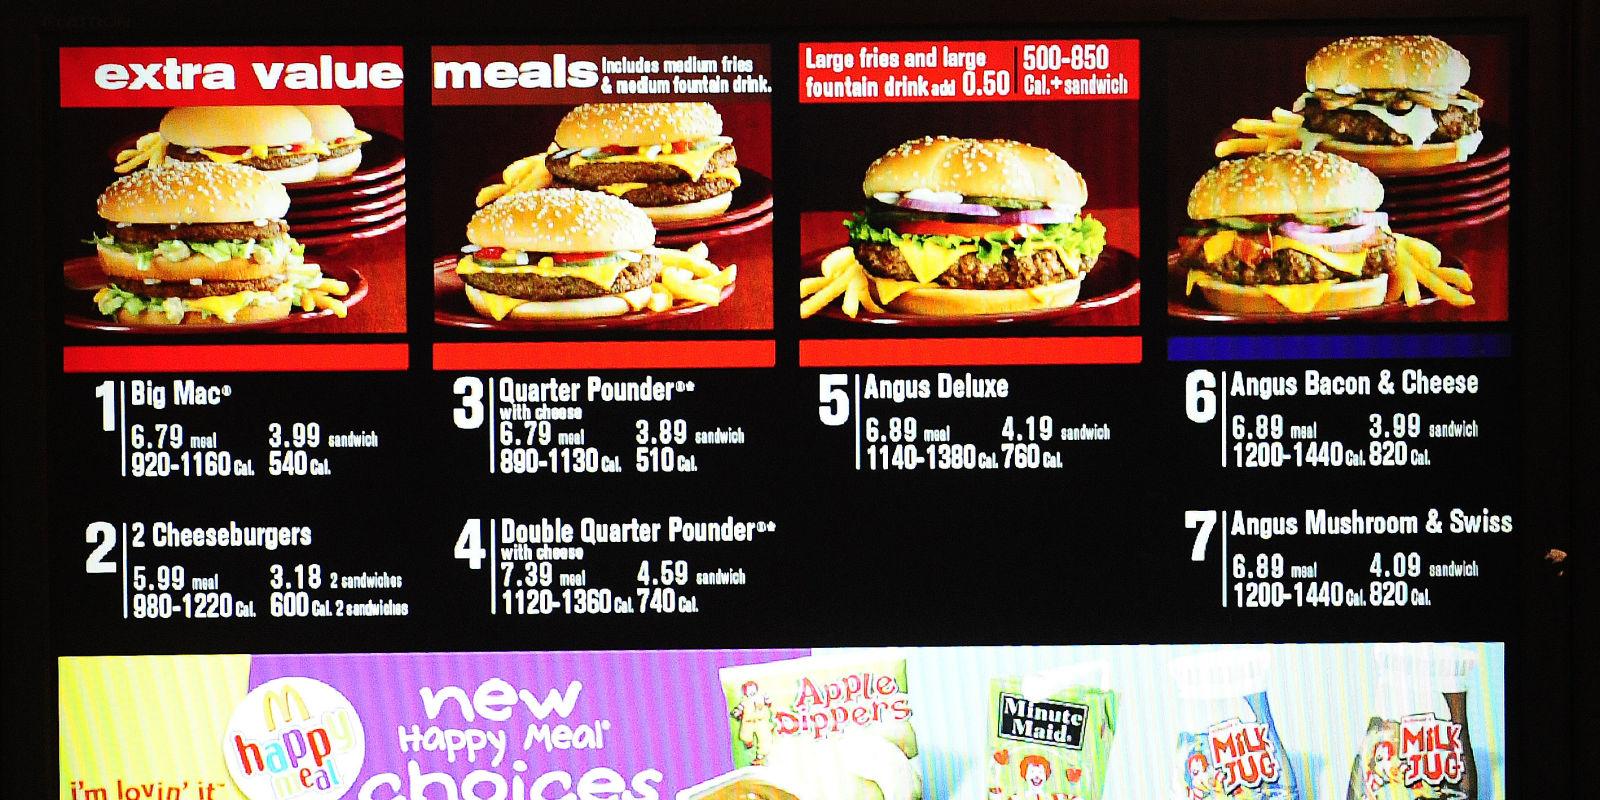 McDonalds Adds Mozzarella Sticks to the Menu